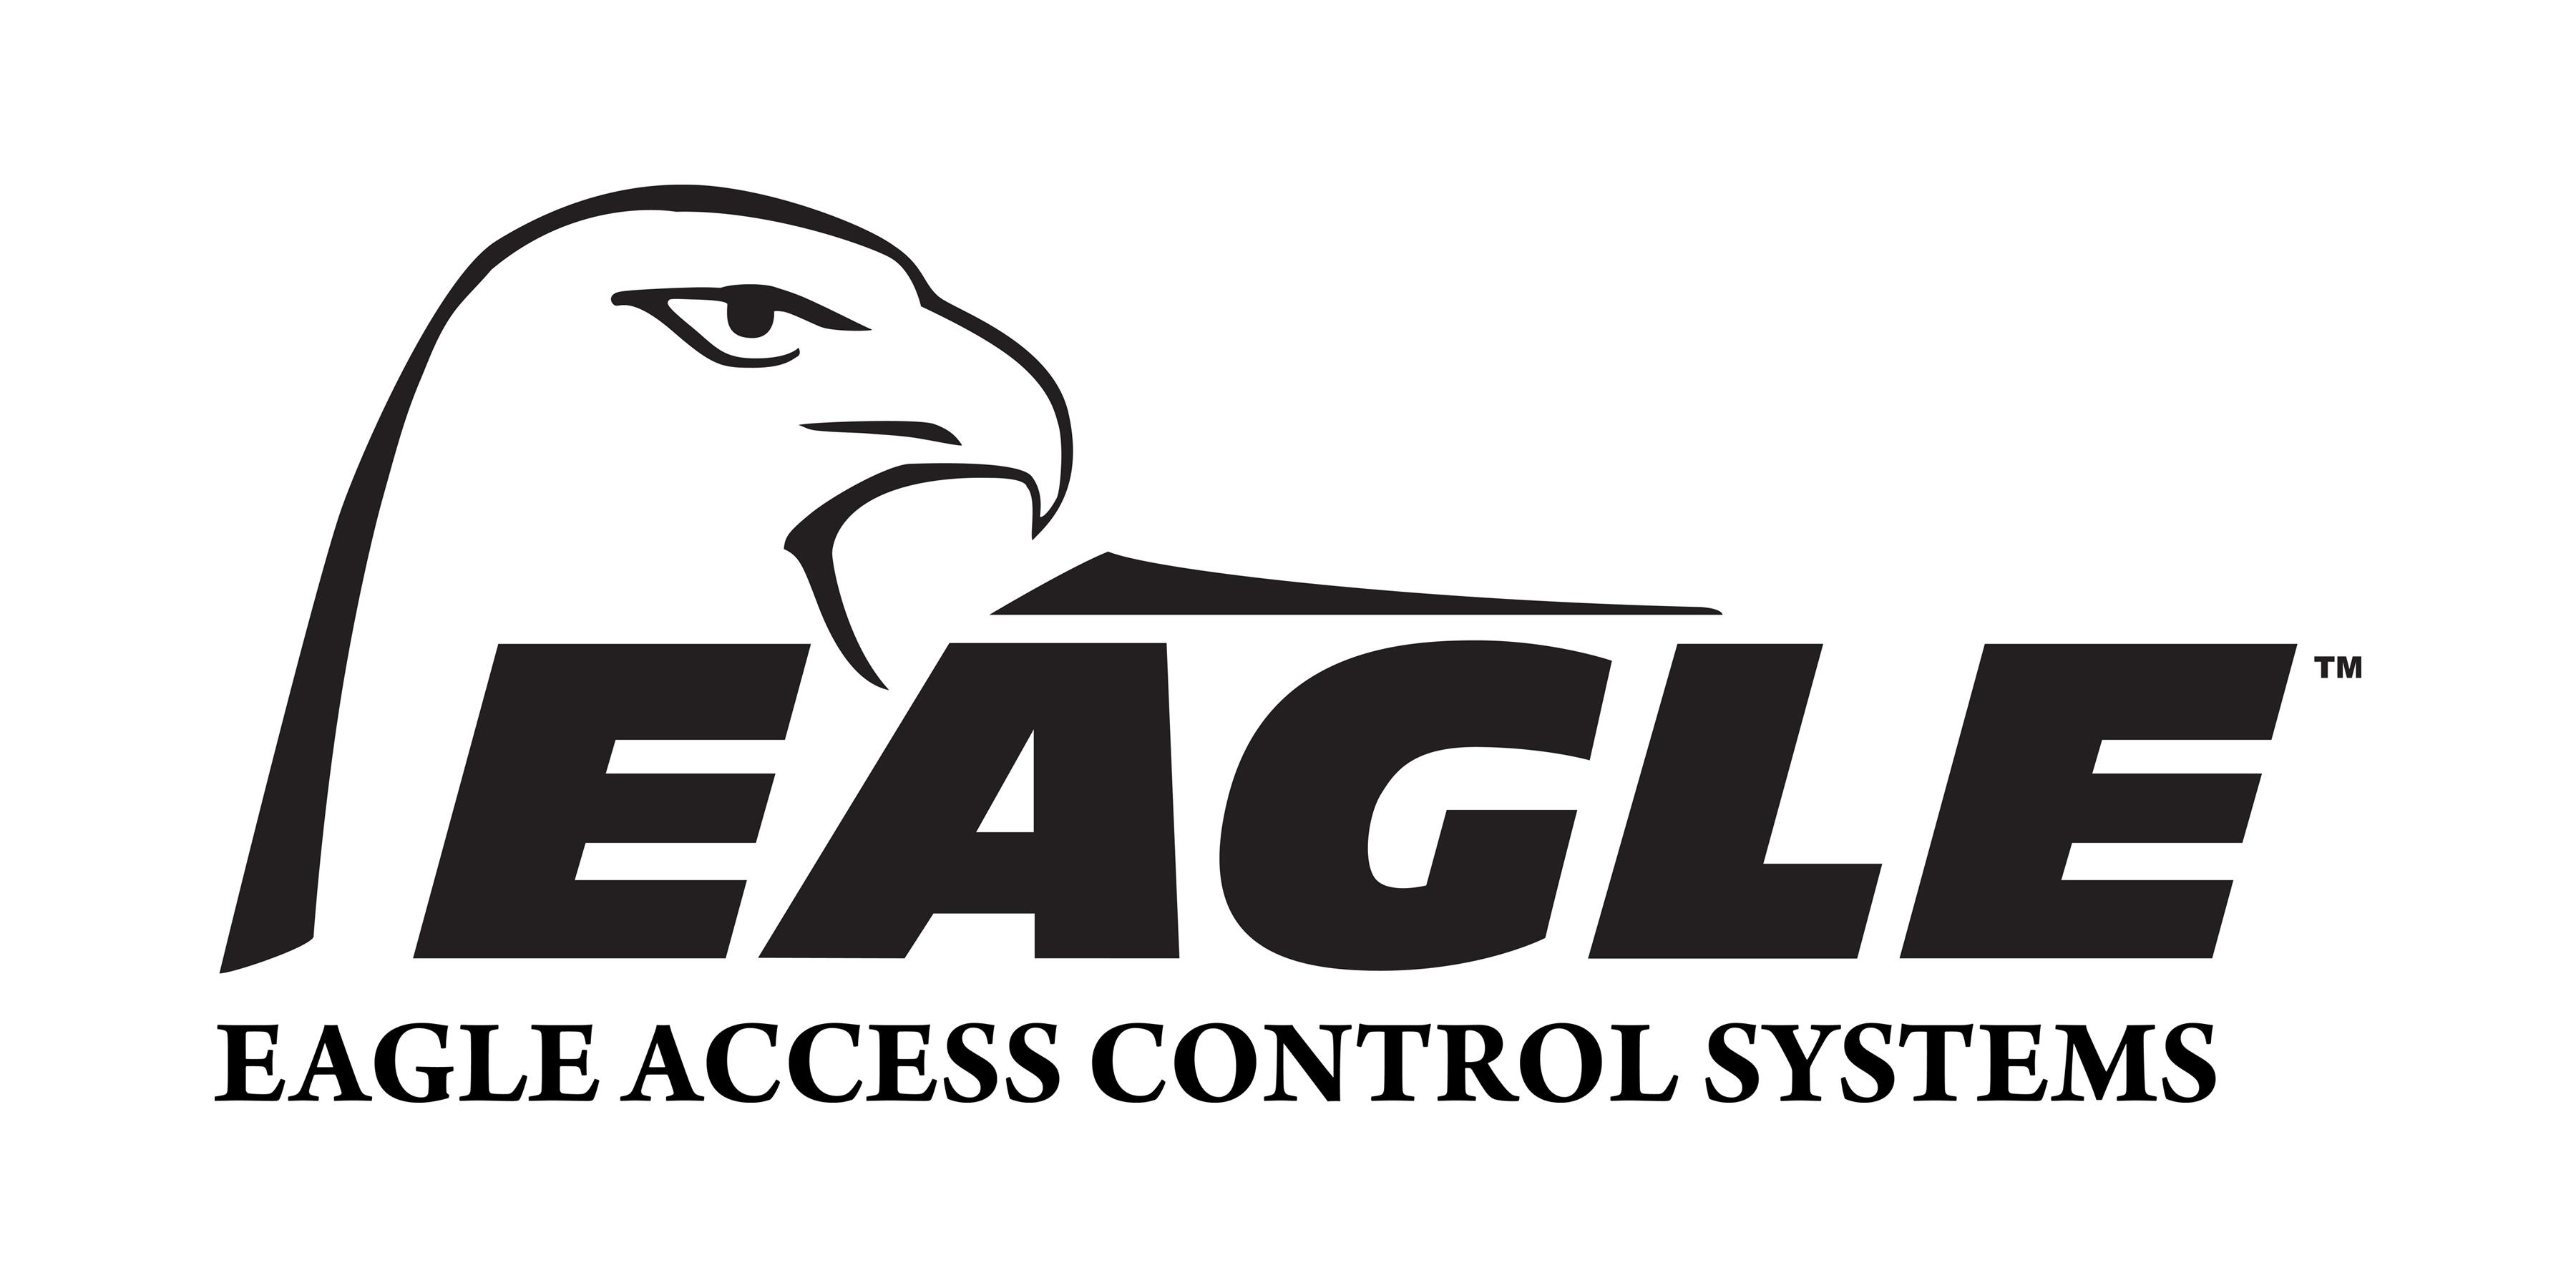 Miami Video Surveillance, CCTV Access Control Installation